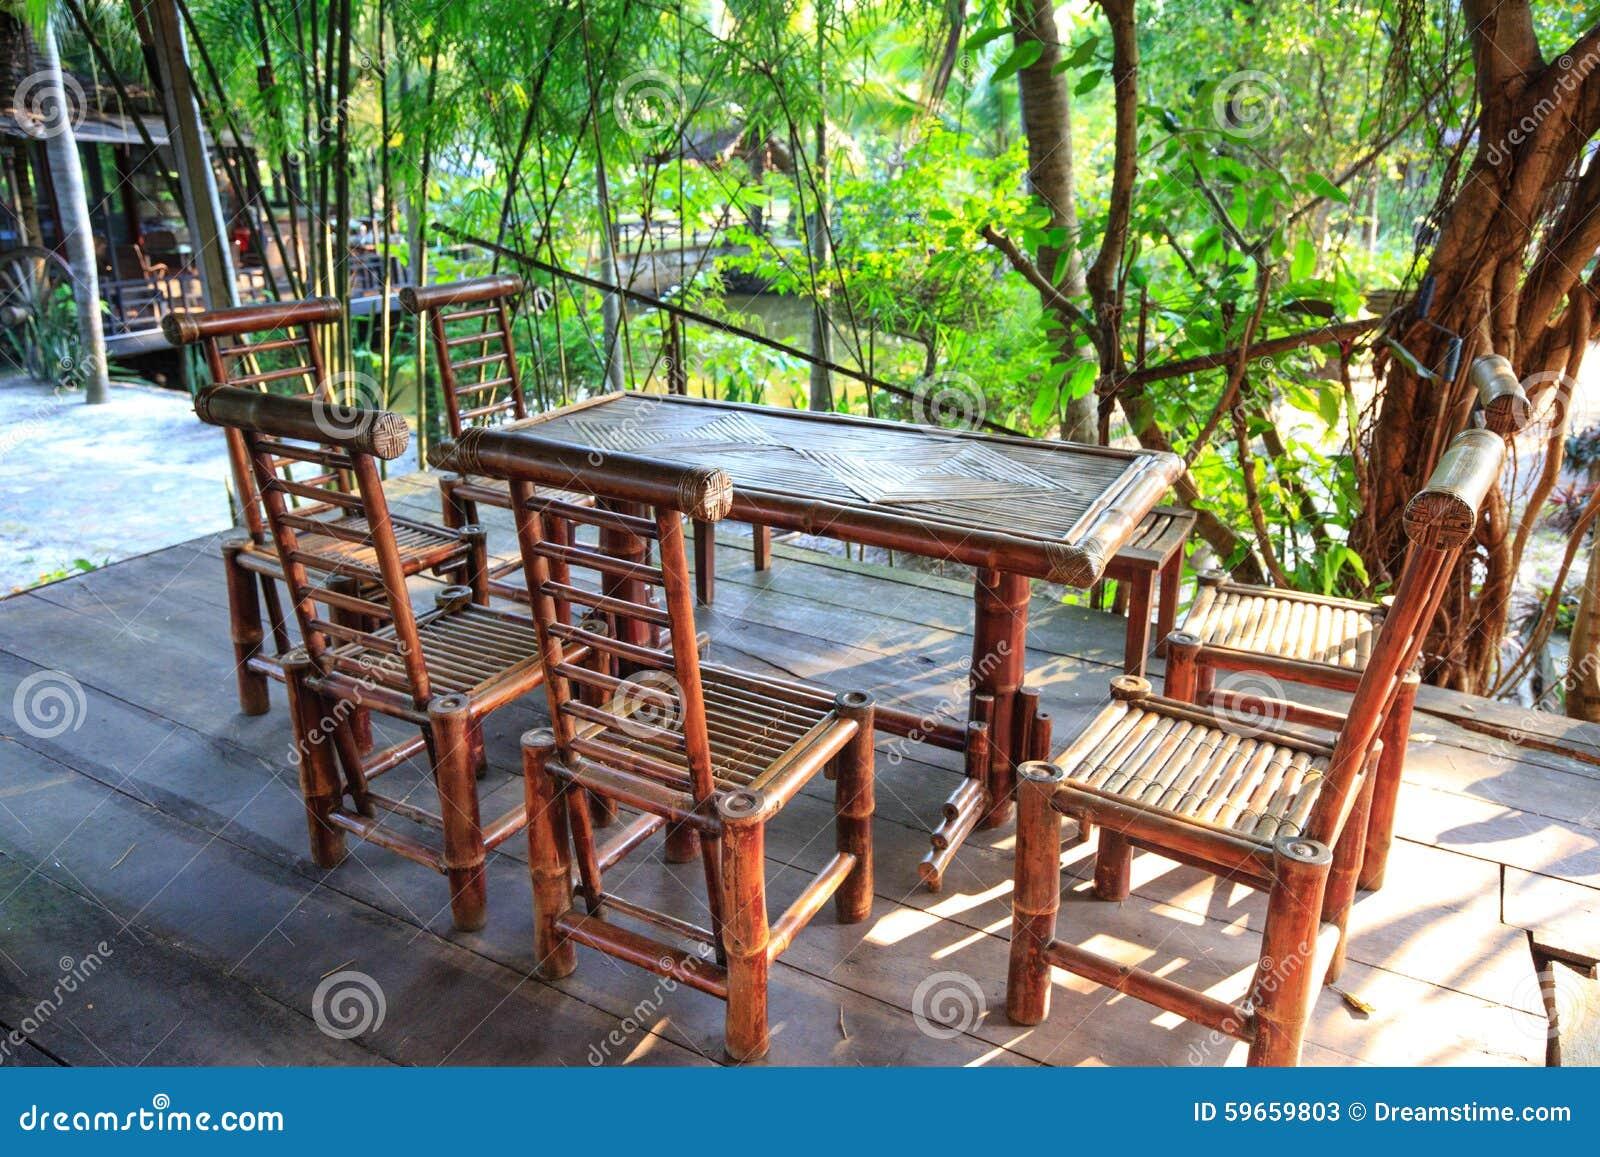 Sillones De Bambu Muebles De Bamb Municipio De Teocelo Veracruz  # Muebles Oasis Caseros